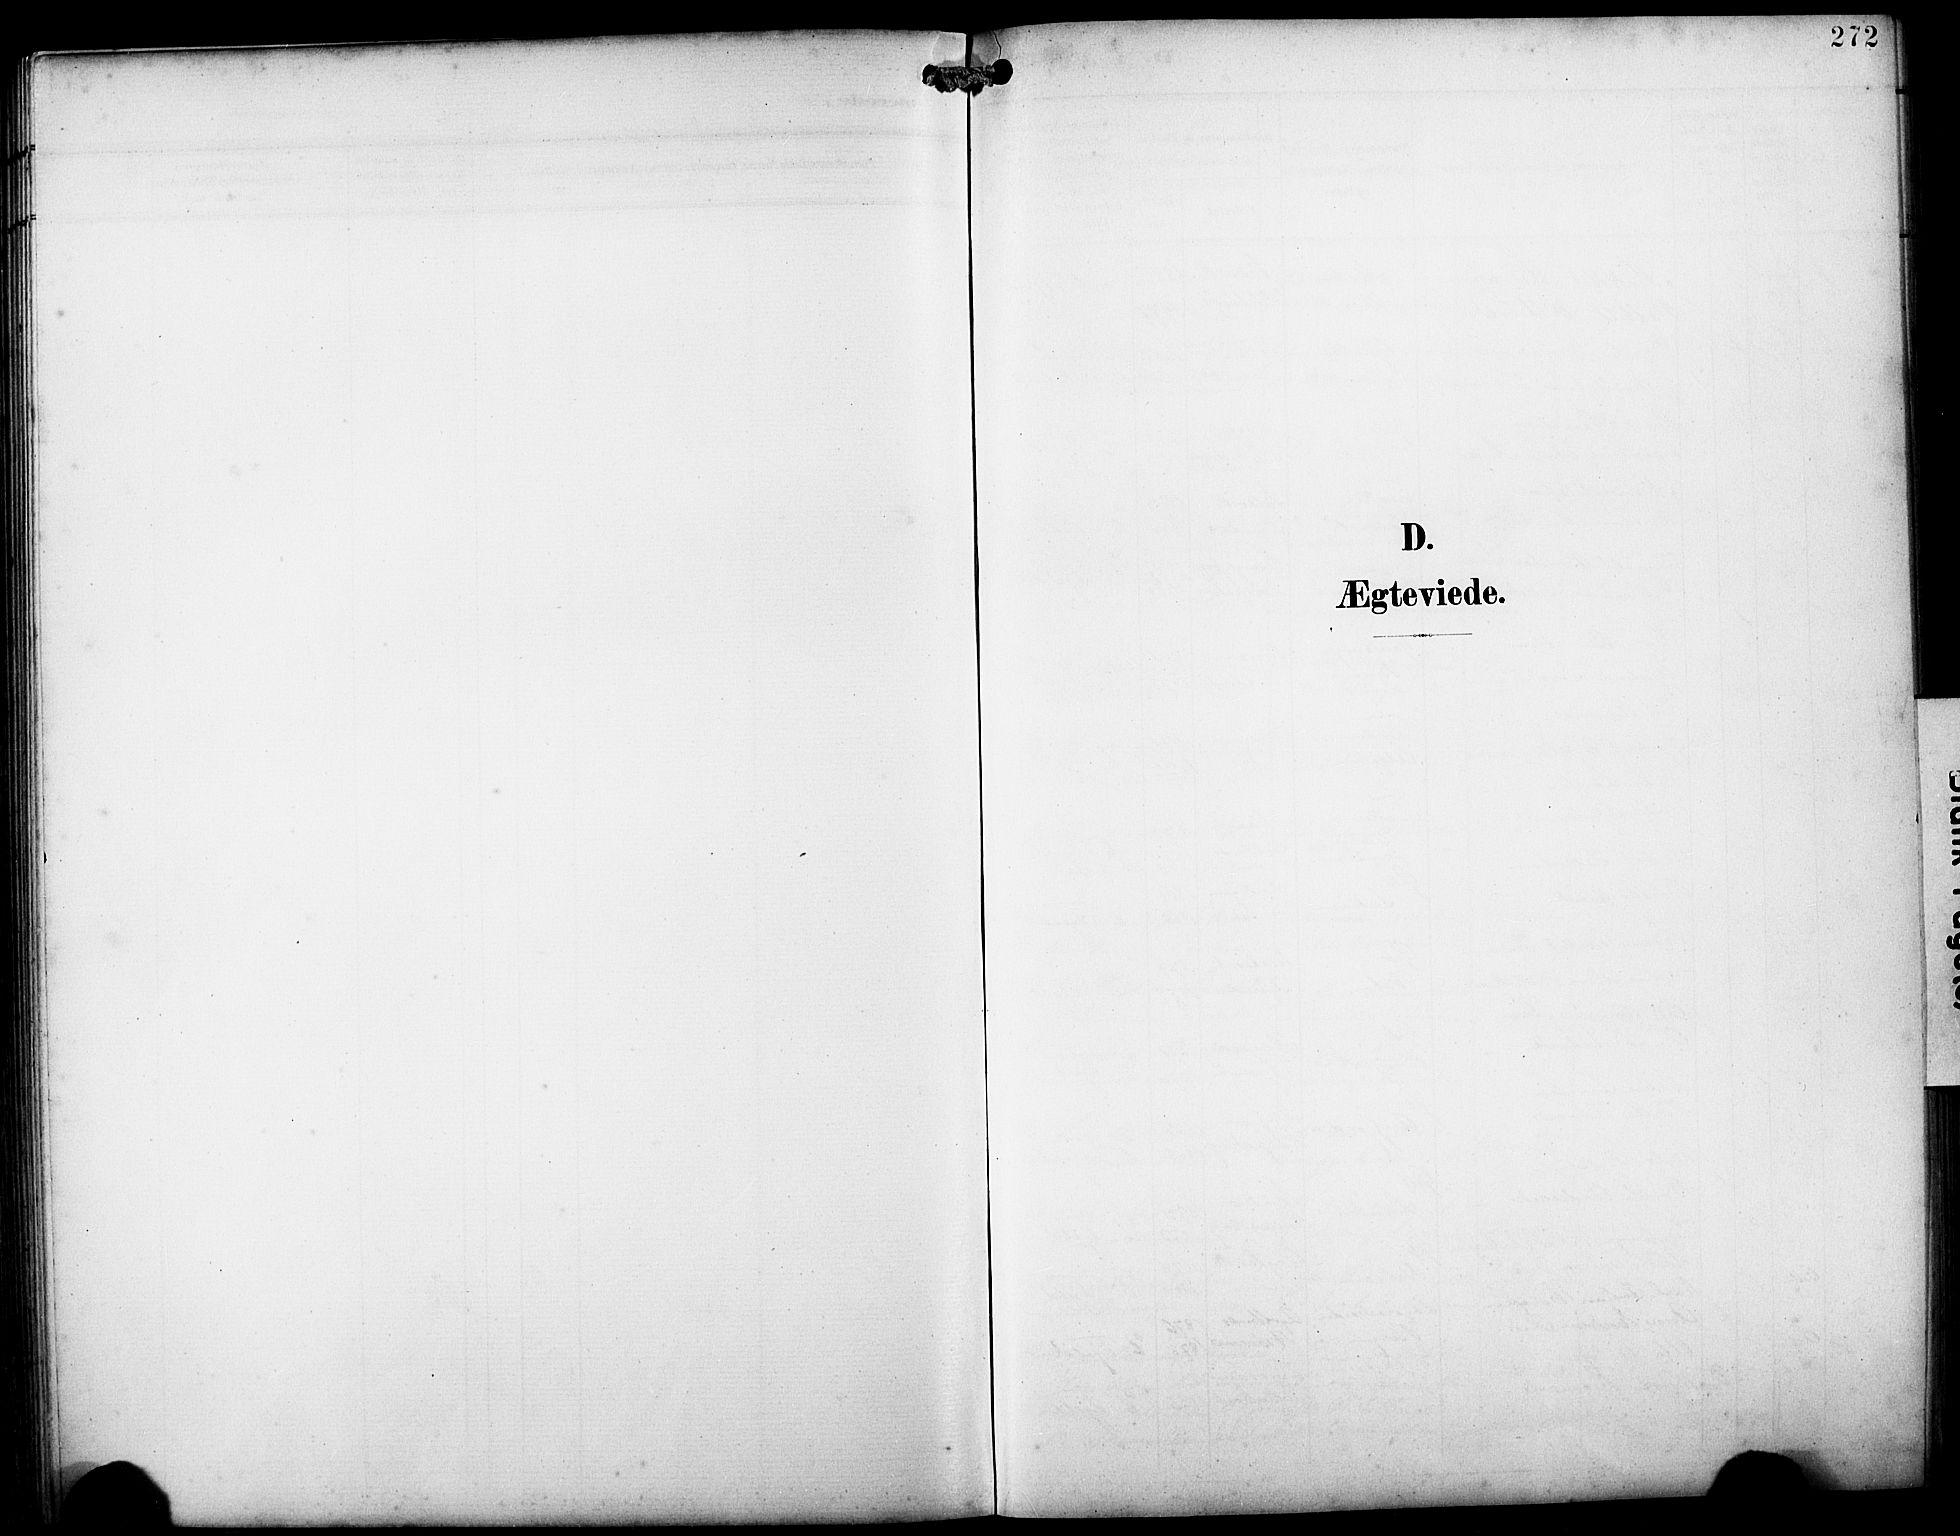 SAB, Fjell sokneprestembete, H/Hab: Klokkerbok nr. A 5, 1899-1918, s. 272